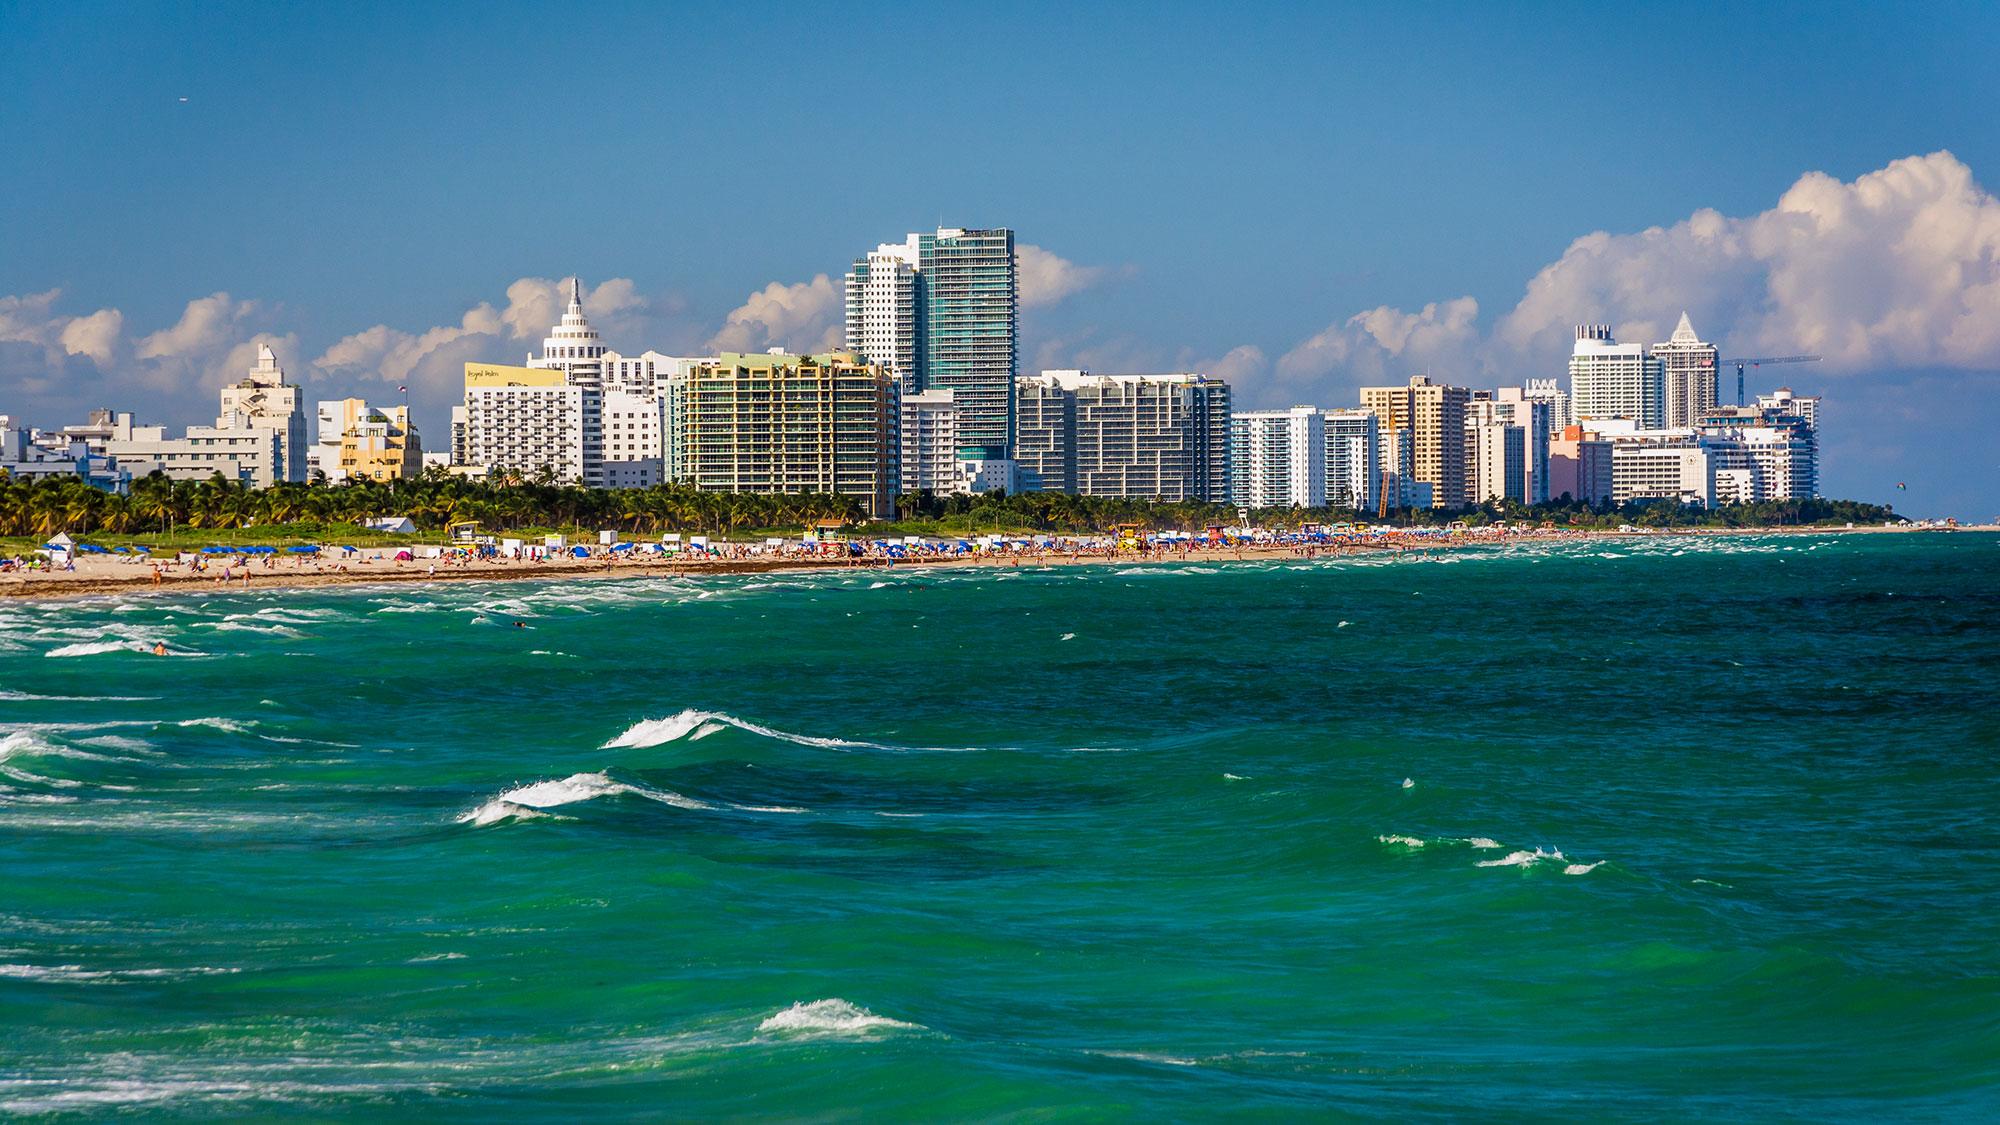 Miamibeach Jpg N 9321 Width 1540 Height 866 Mode Crop Anchor Middlecenter